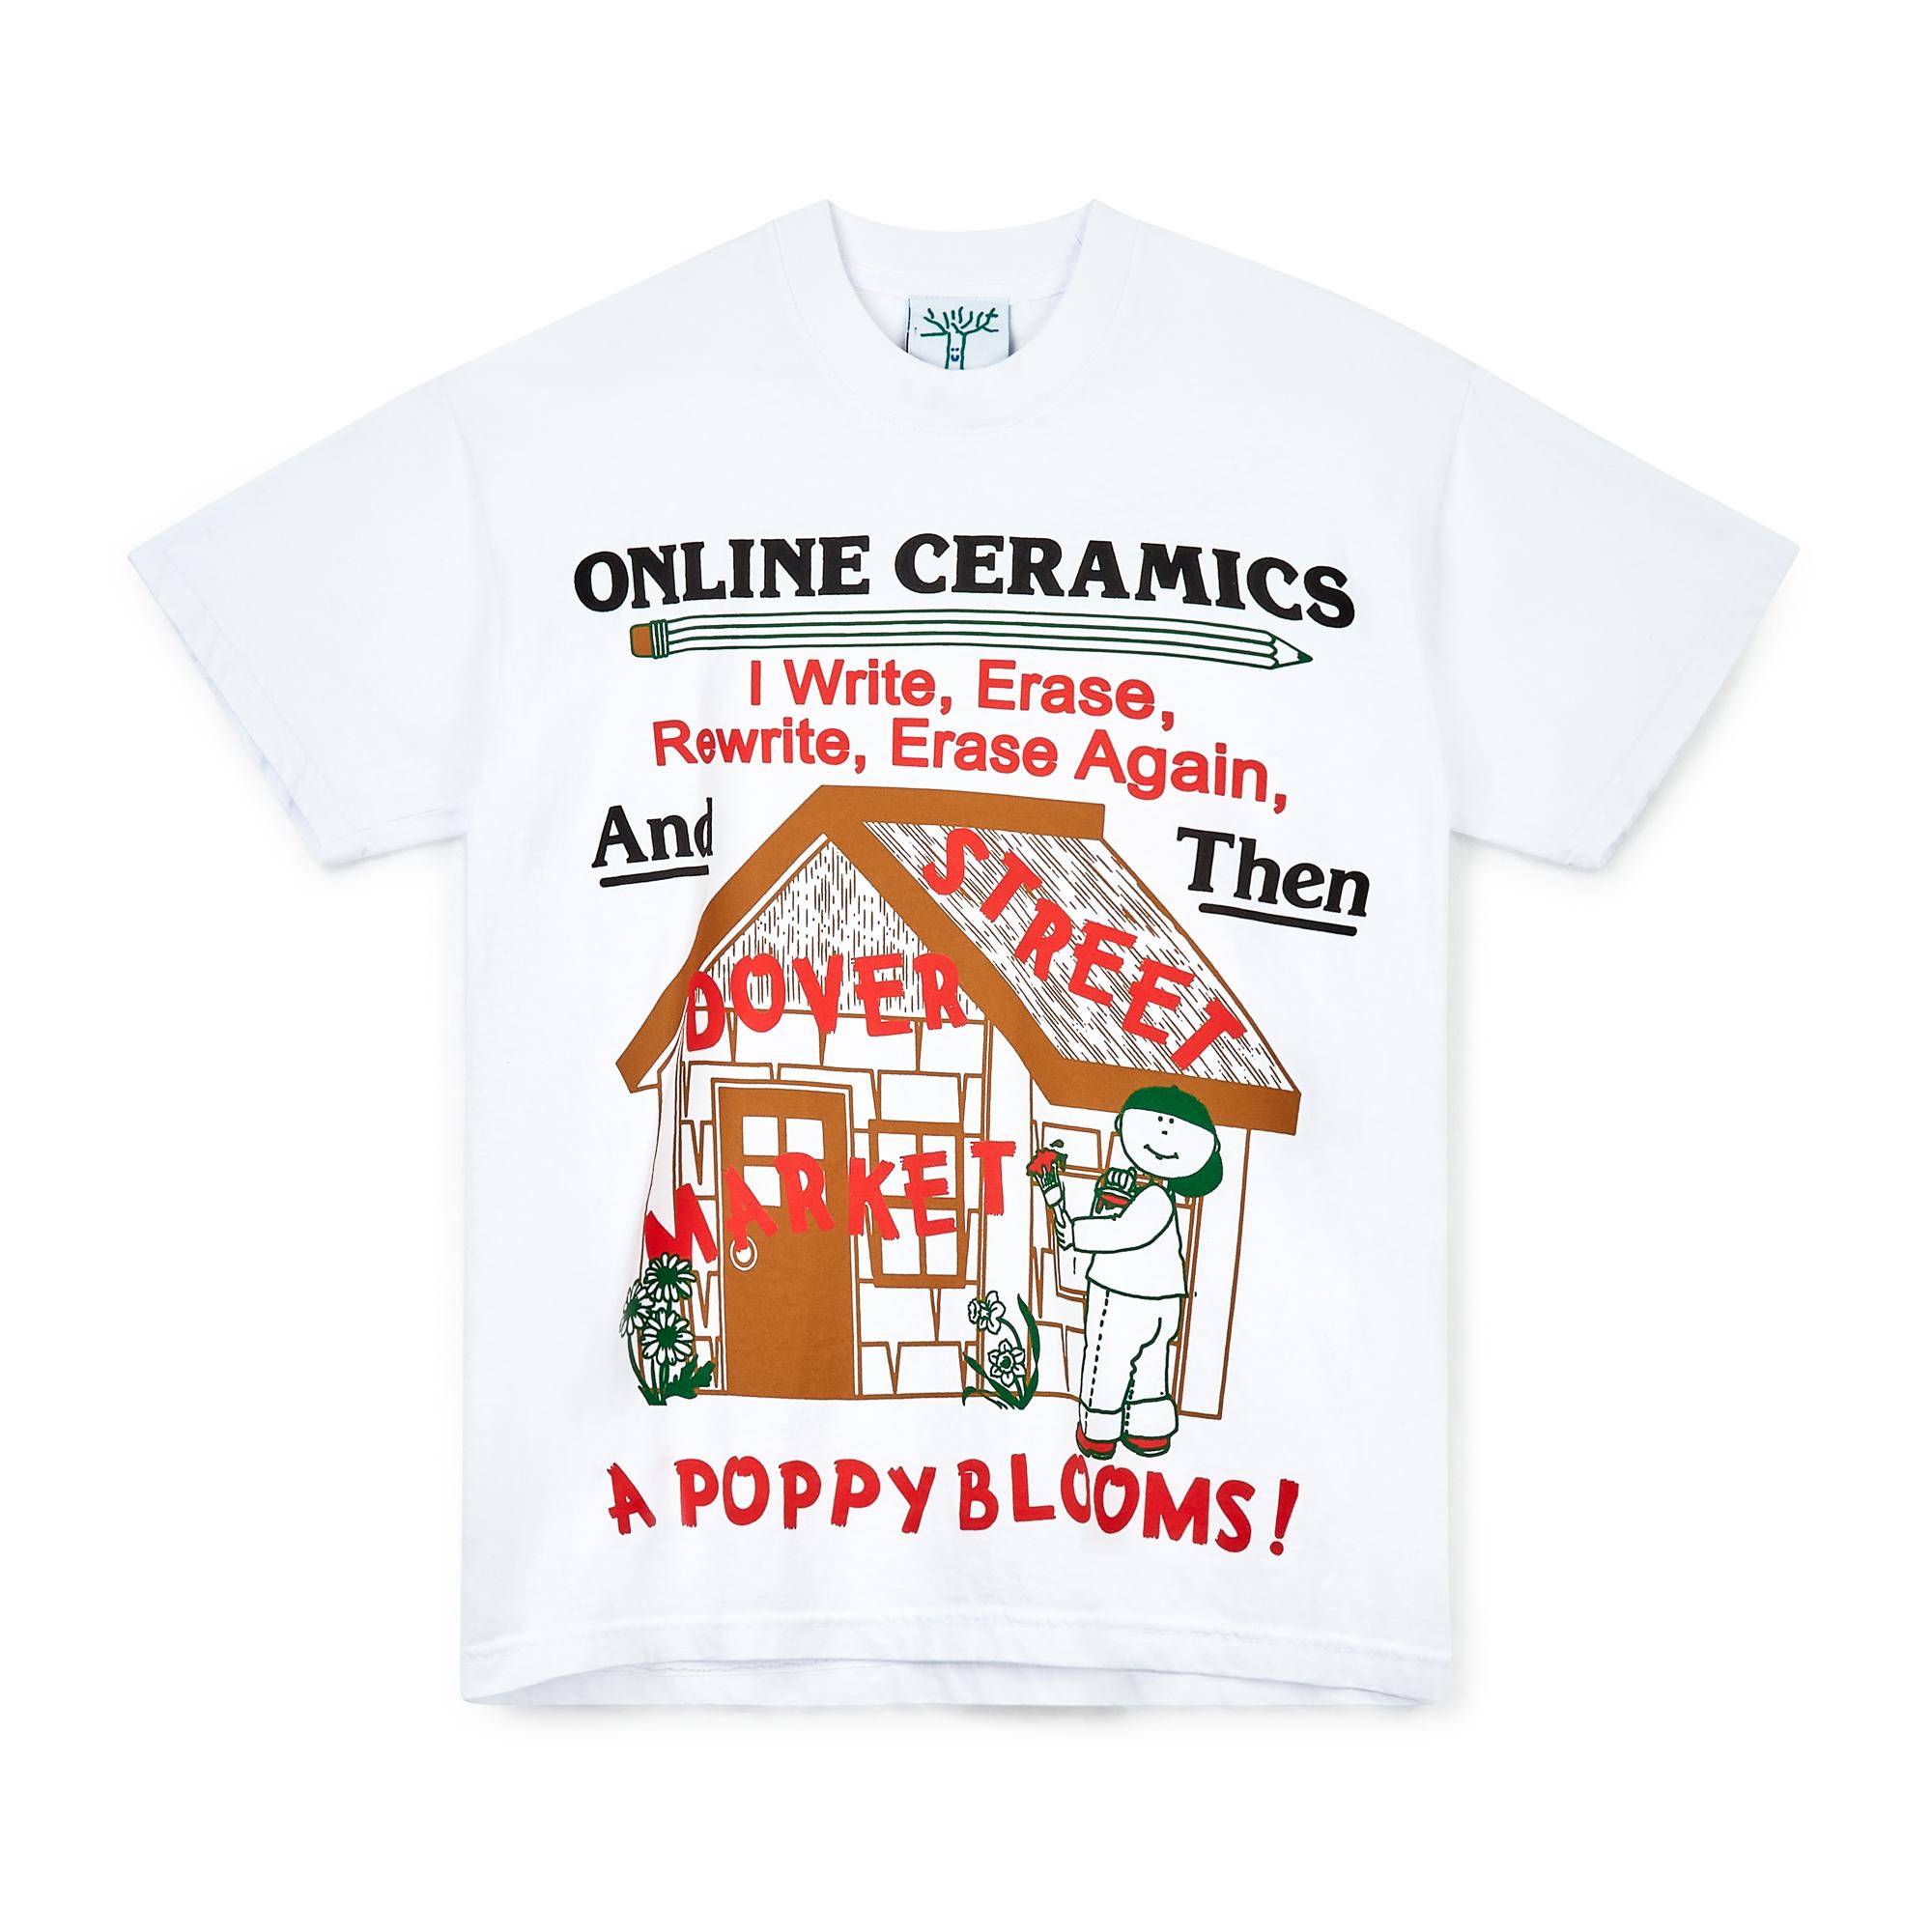 Online Ceramics - shot 23